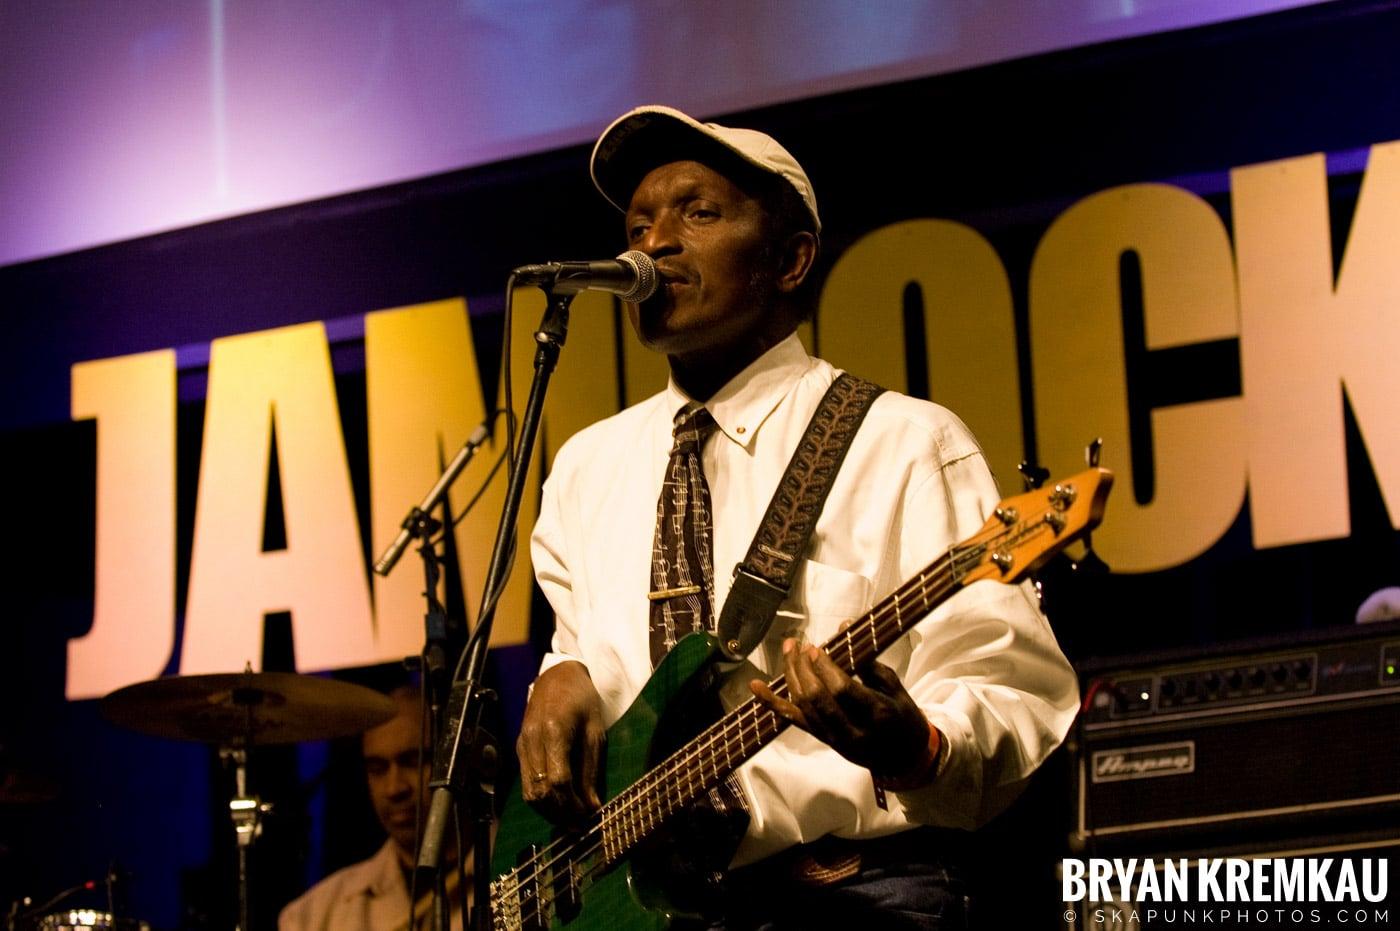 Lloyd Parks @ Vintage Reggae Fest - Hammerstein Ballroom, NYC - 12.16.2007 (3)